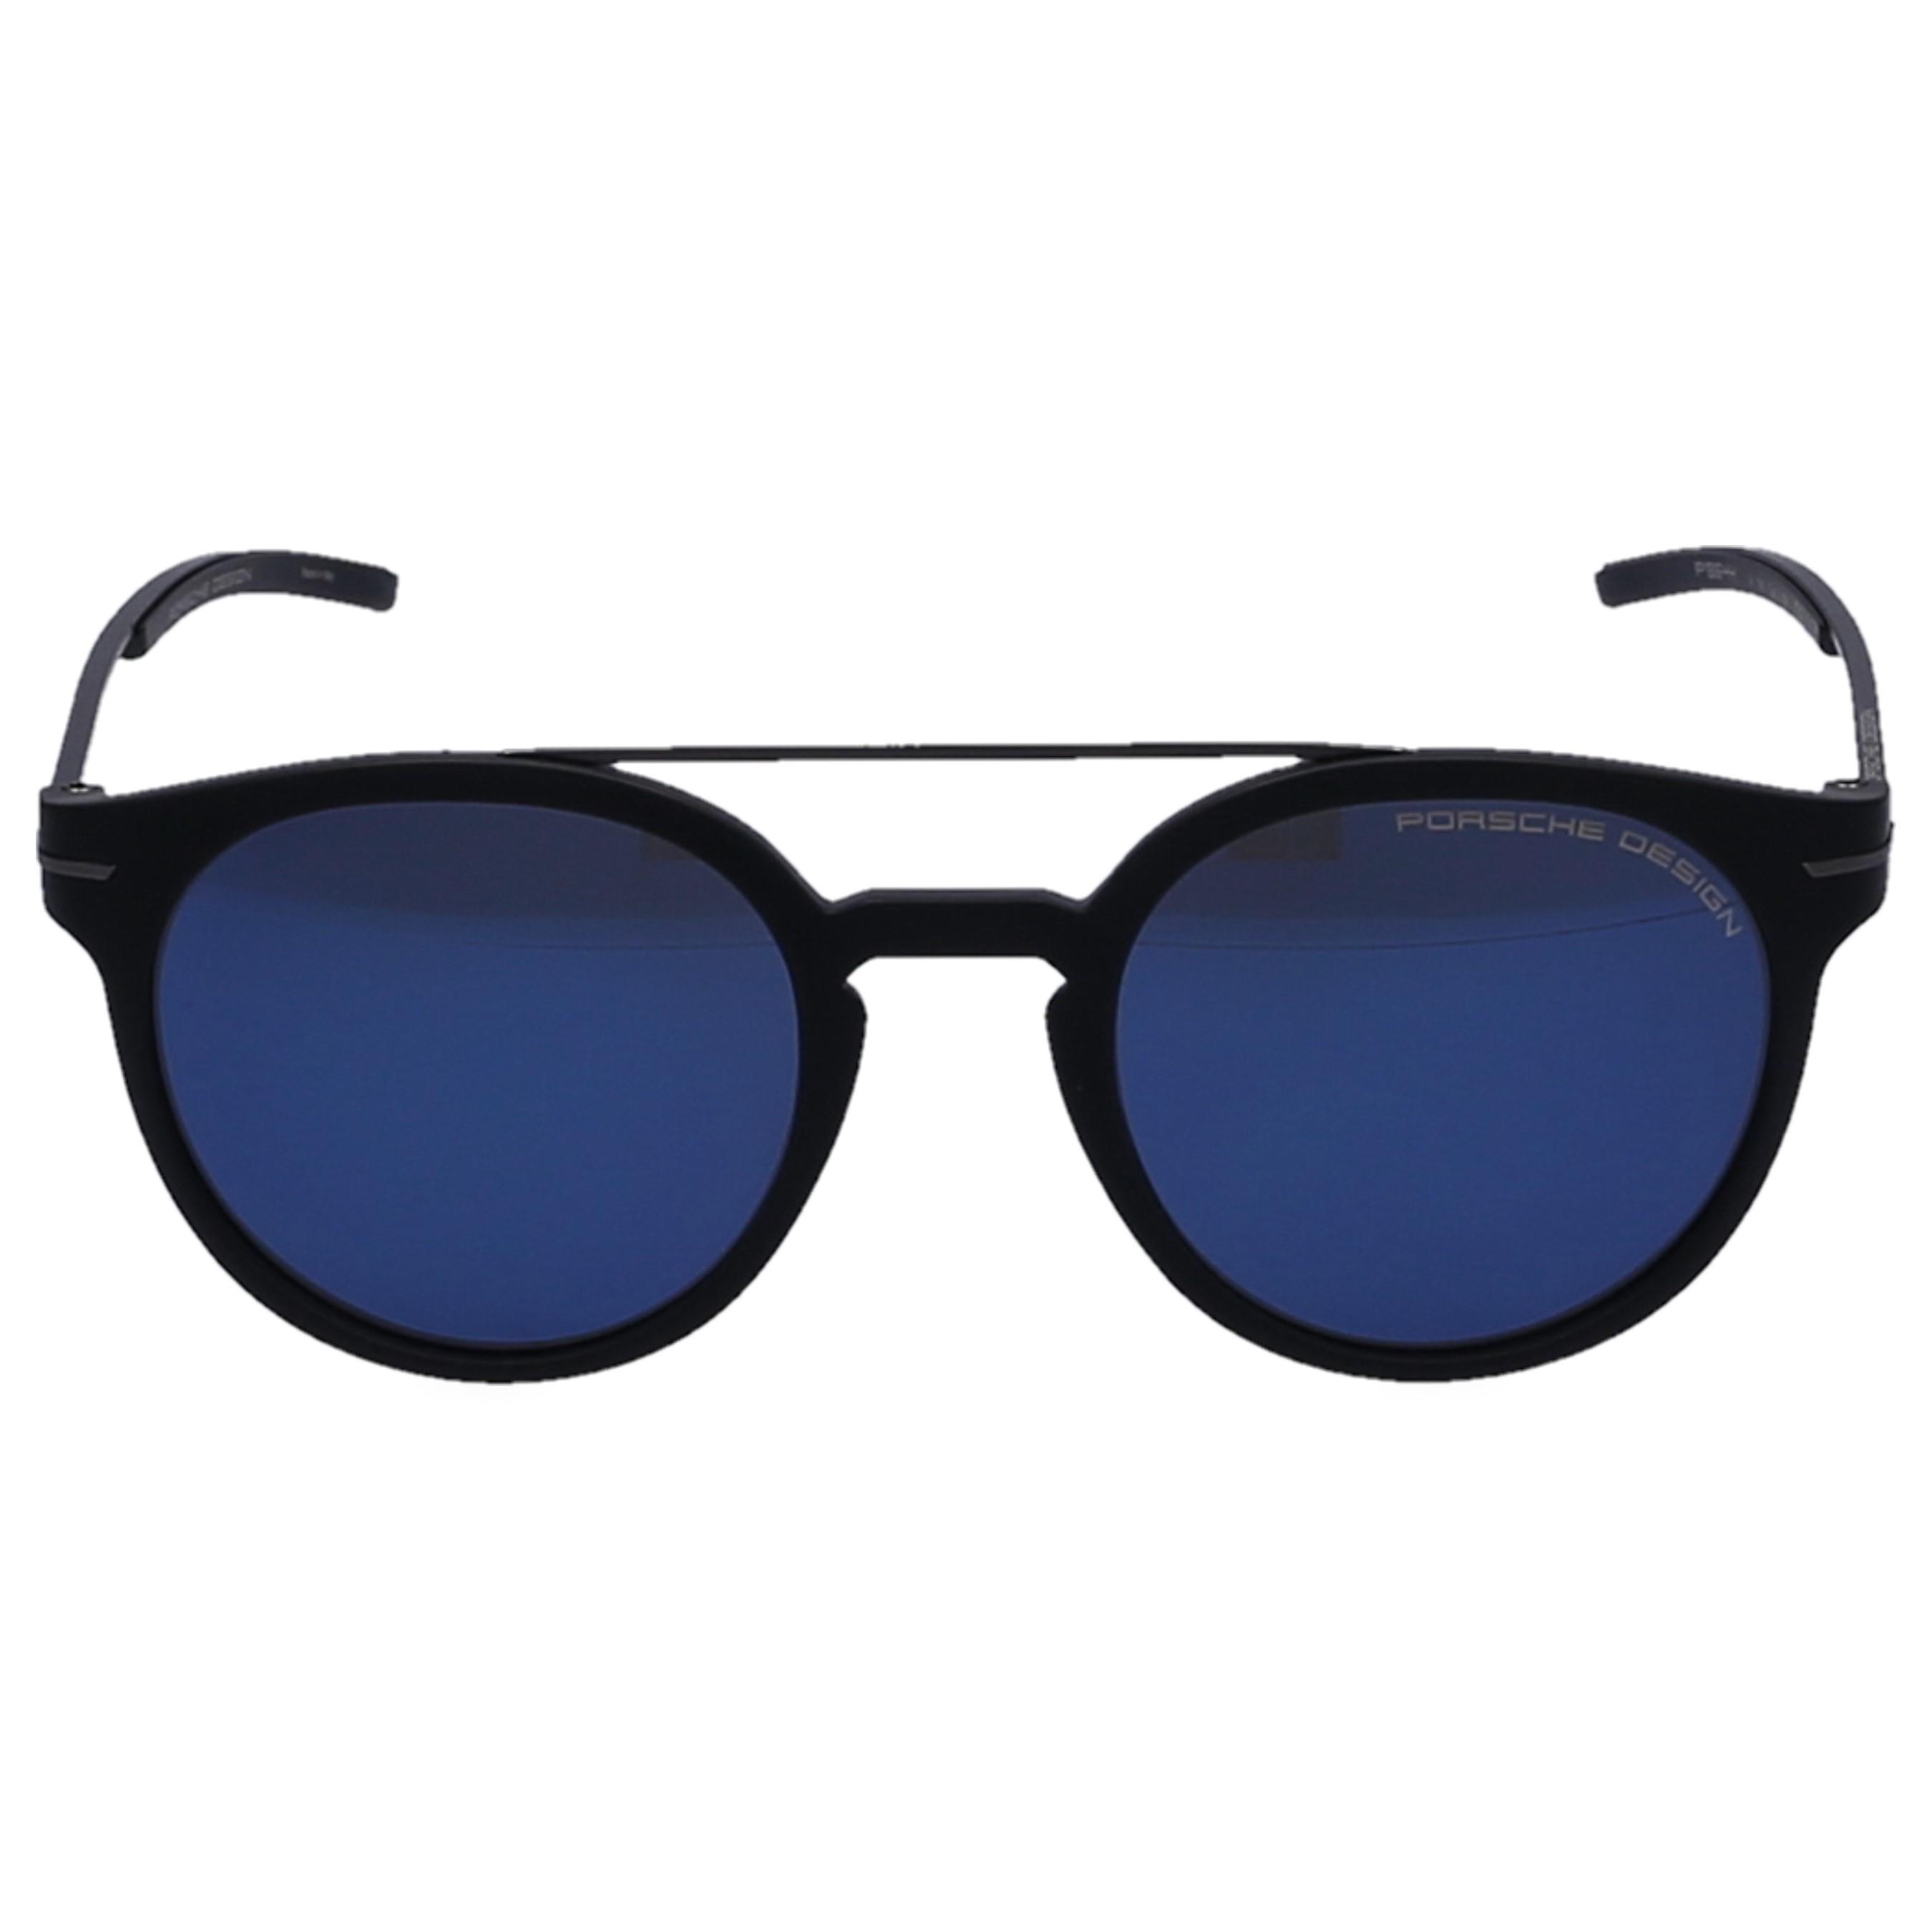 d5e8db76c8f Porsche Design. Men s Blue Sunglasses Clubmaster 8644 Metal Acetate Black